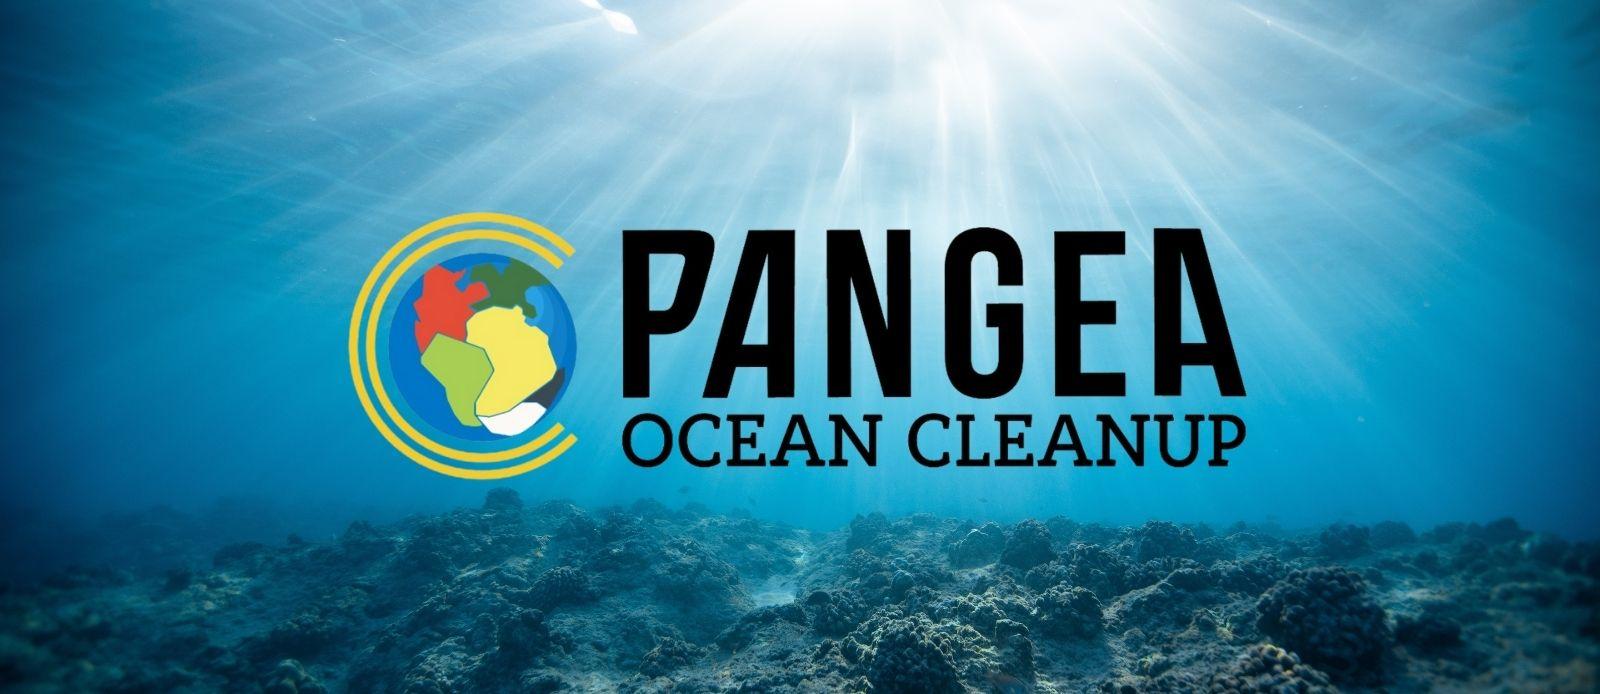 Pangea Ocean Cleanup Announces World Ocean Week Campaign 1